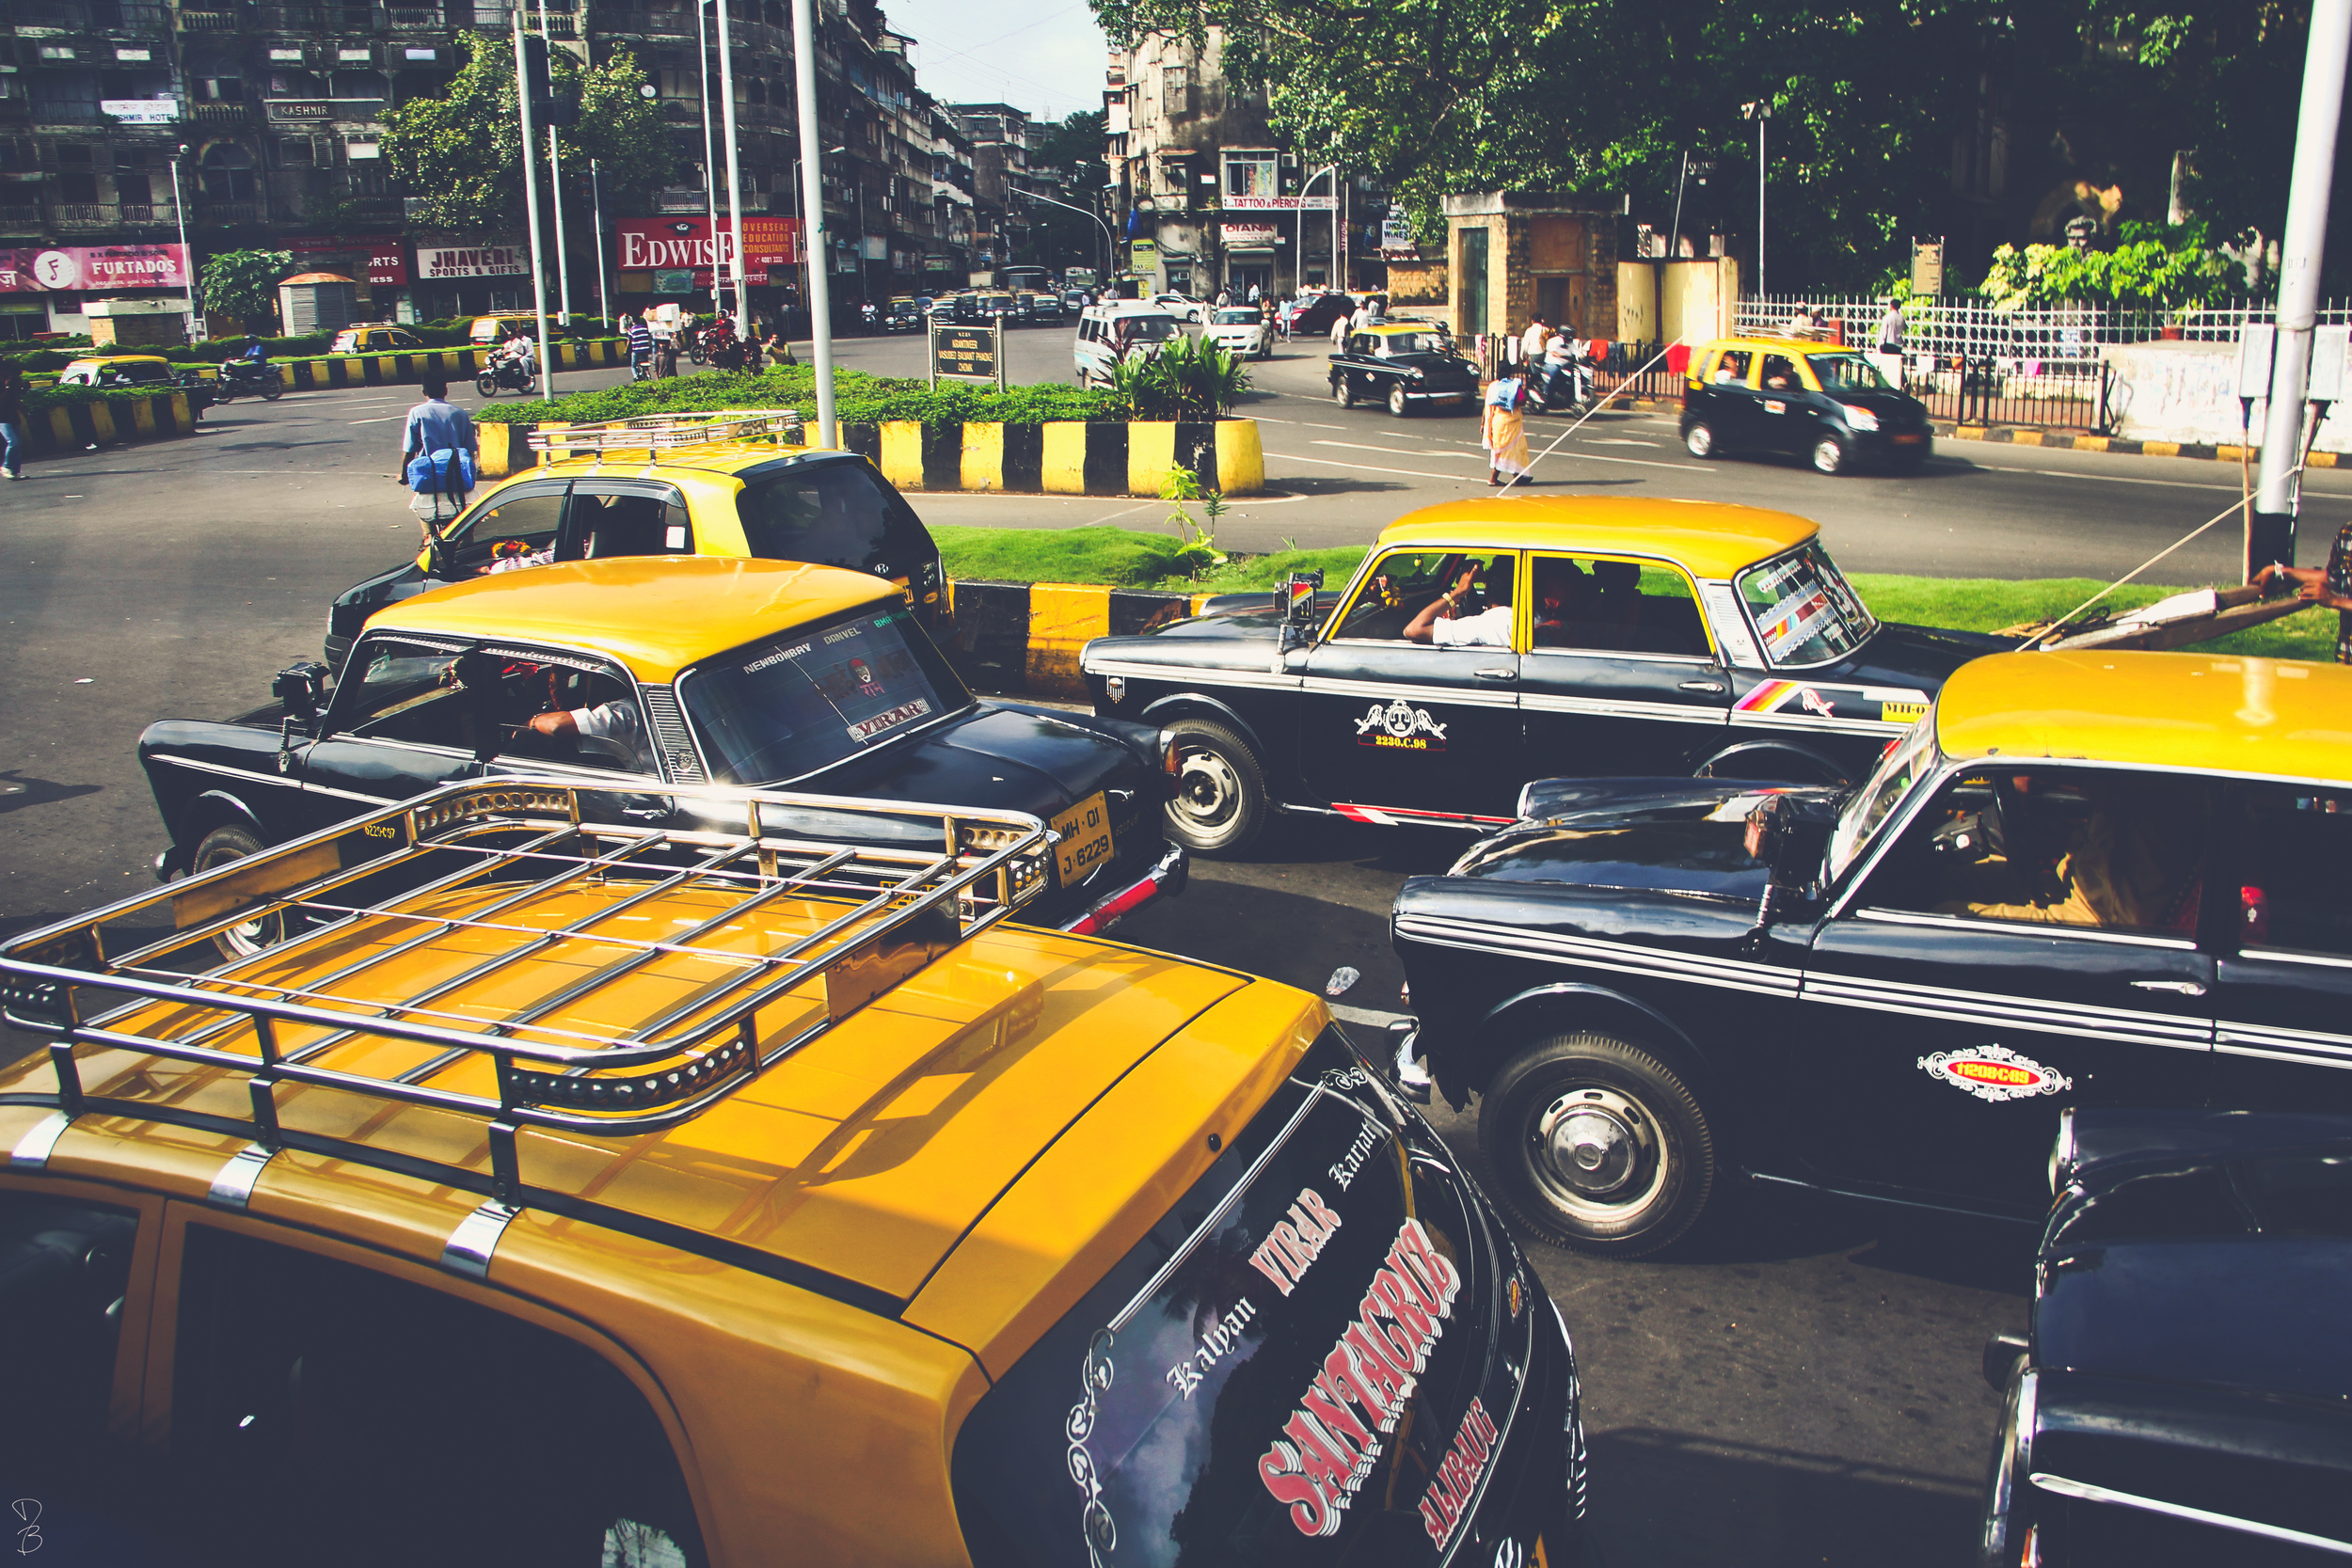 taxis in mumbai.jpg